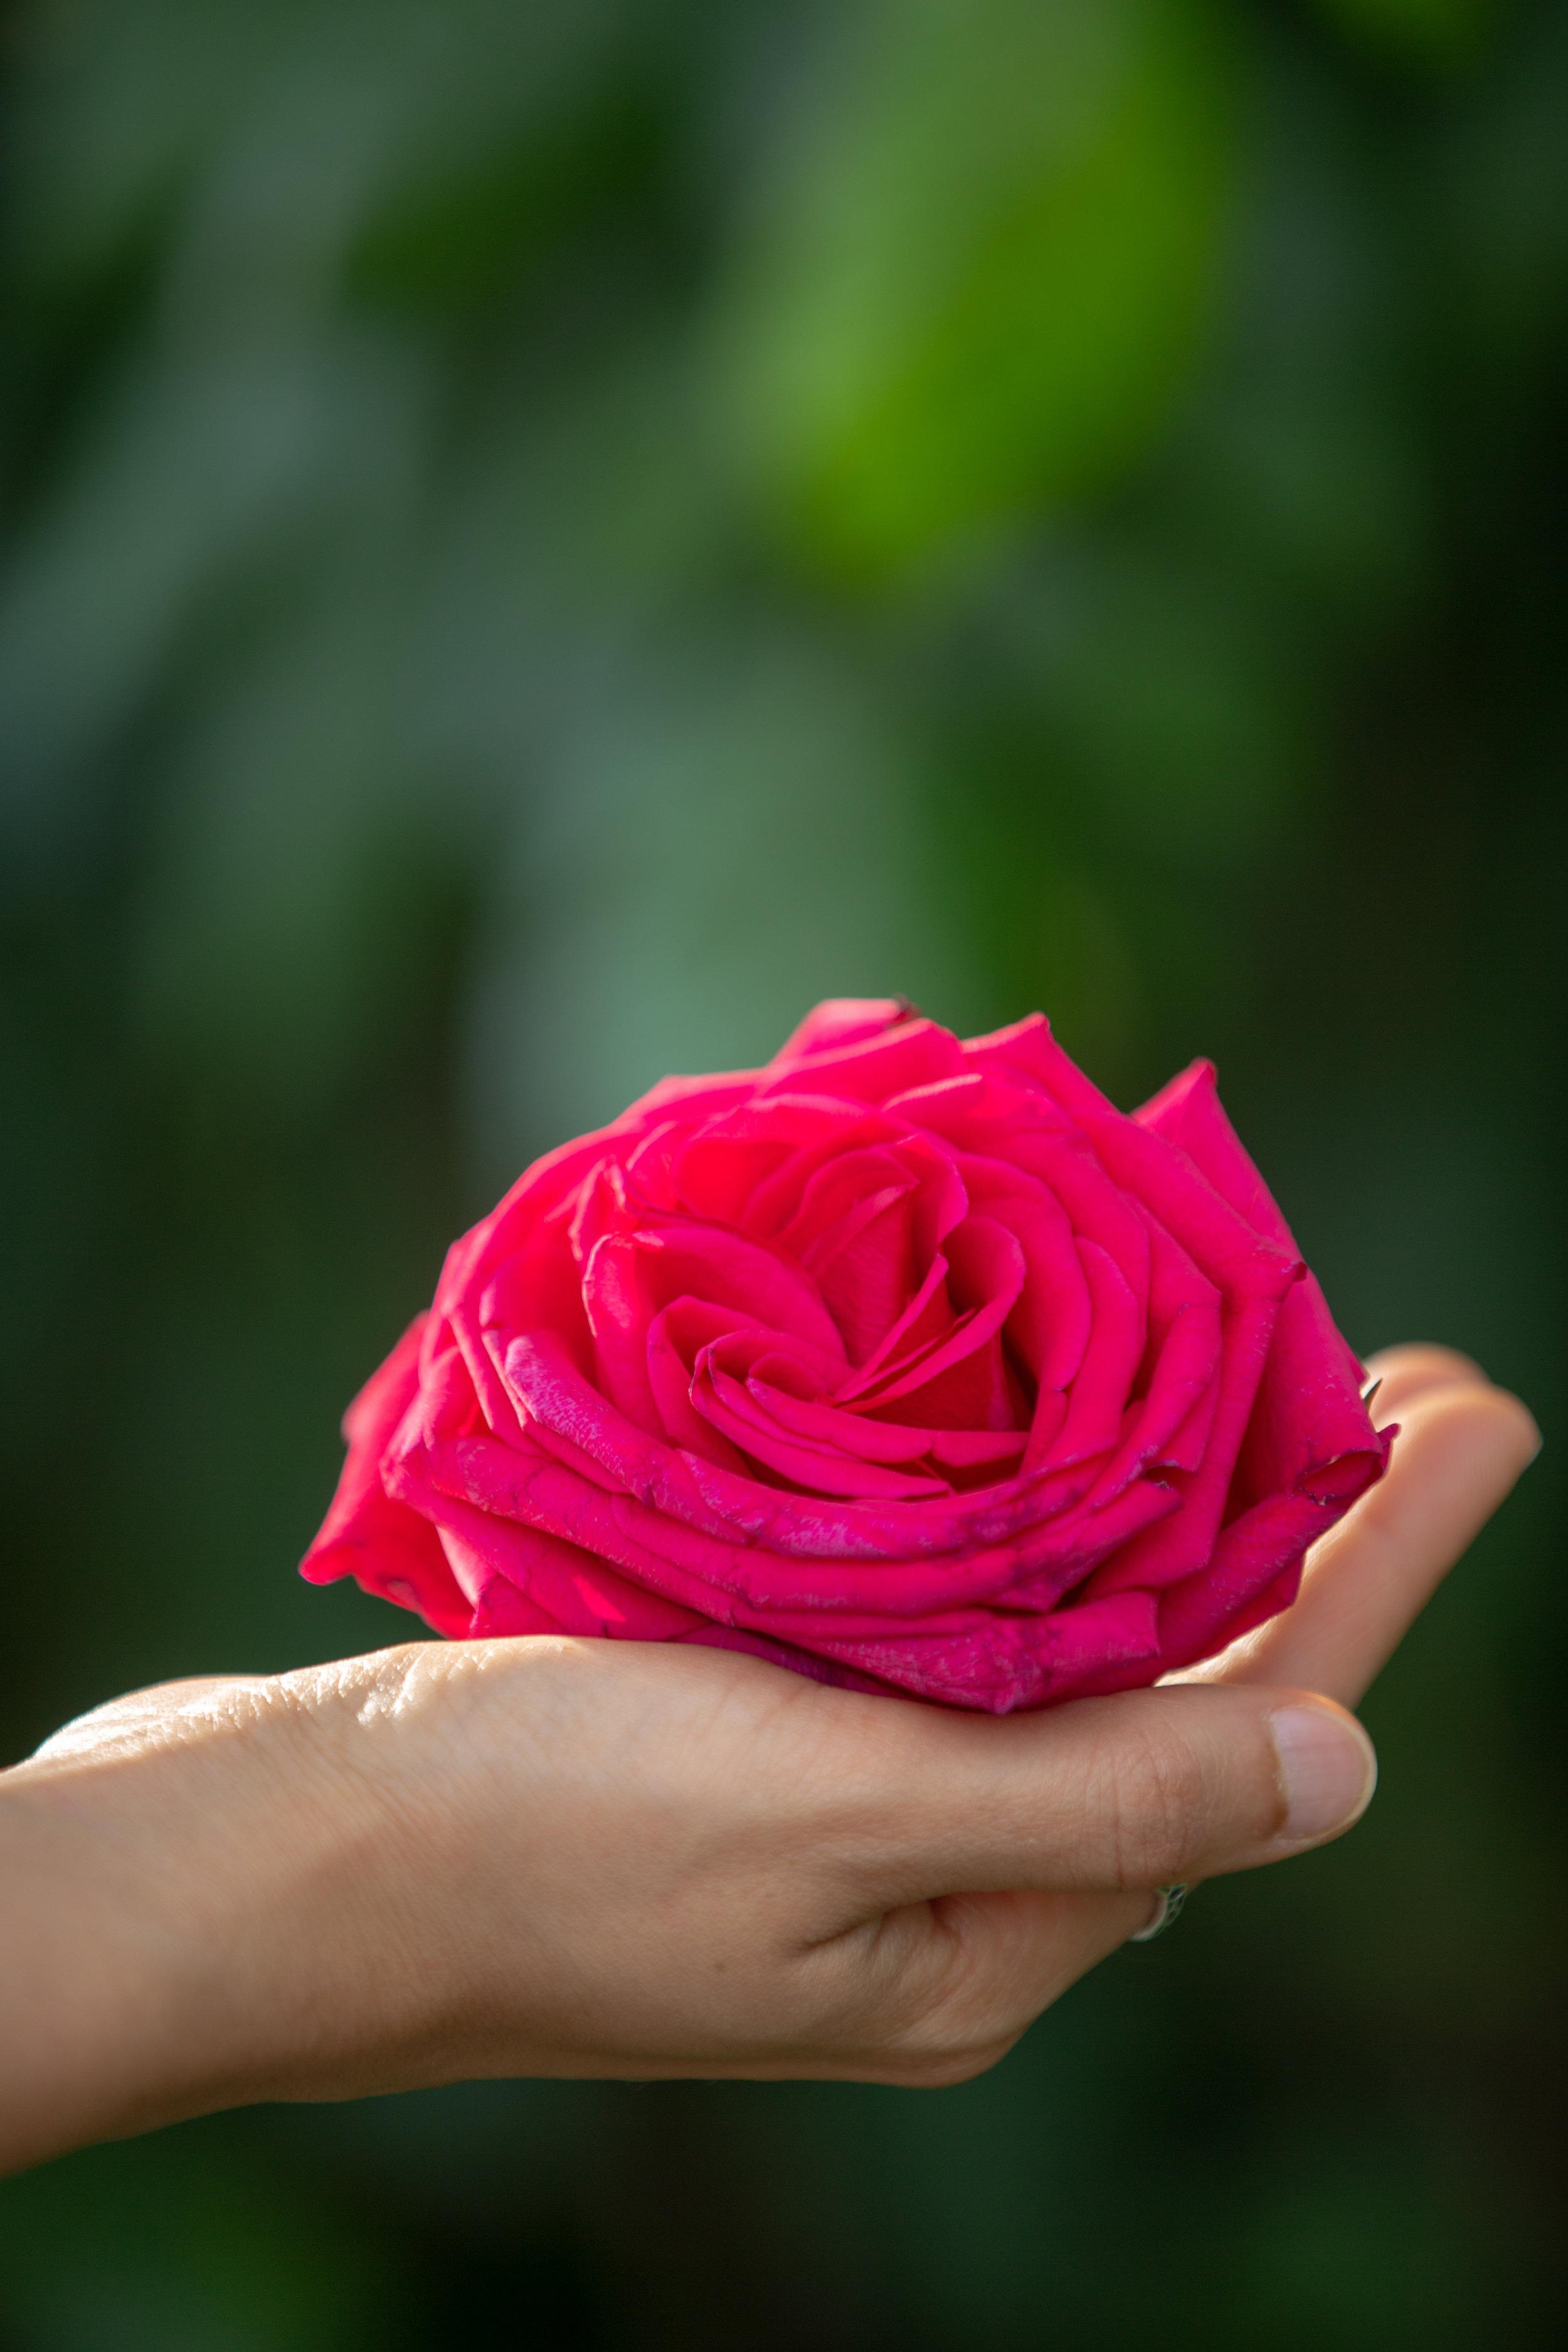 Geeti Shirazi Mahajan Counseling Yoga Rose in Palm of Hand.jpg